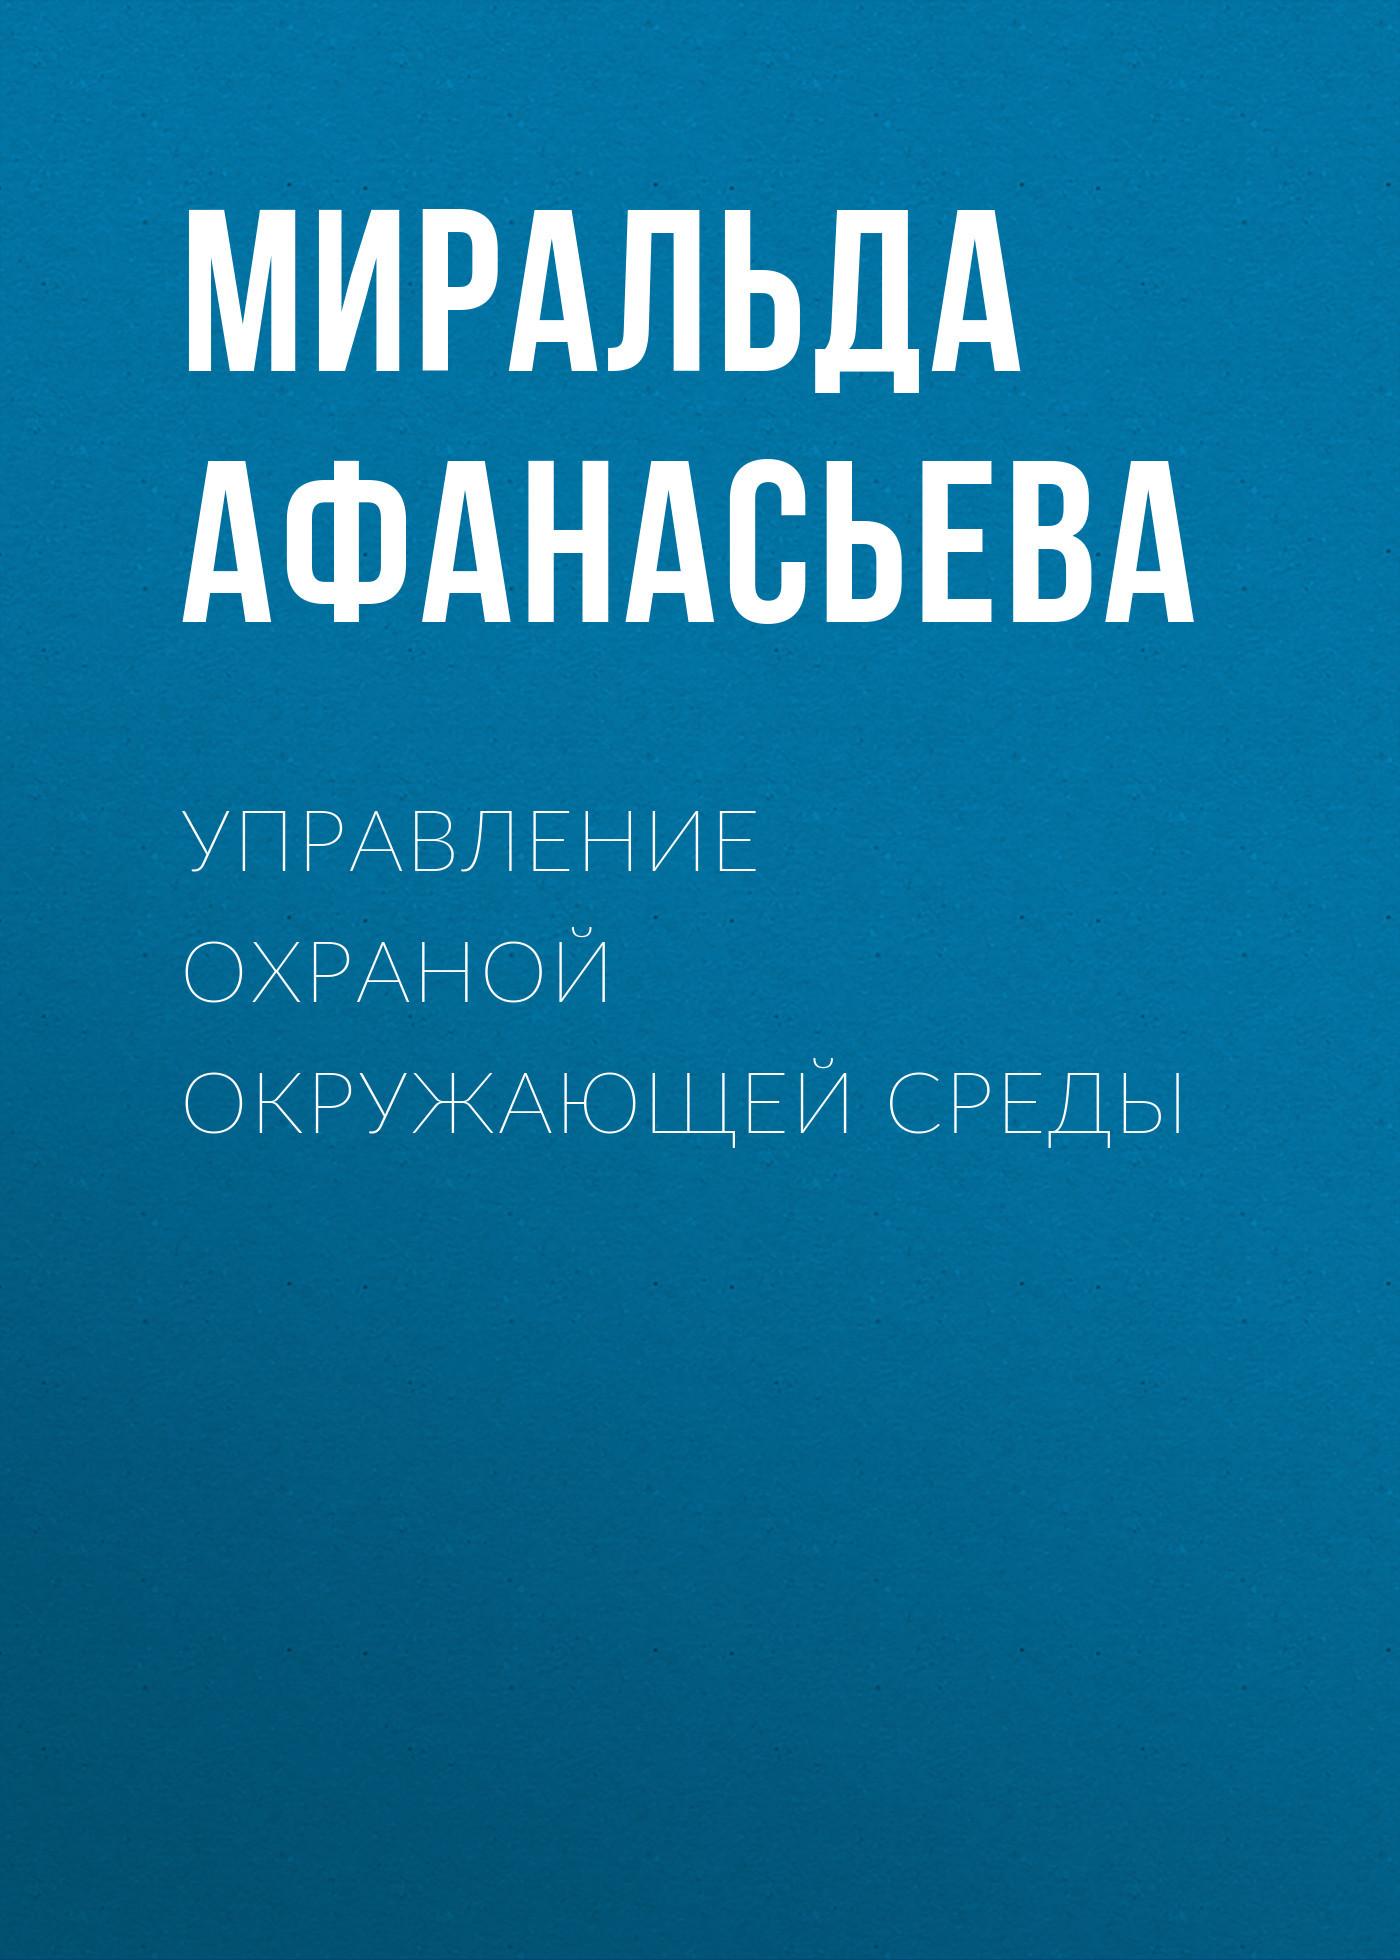 Миральда Афанасьева бесплатно